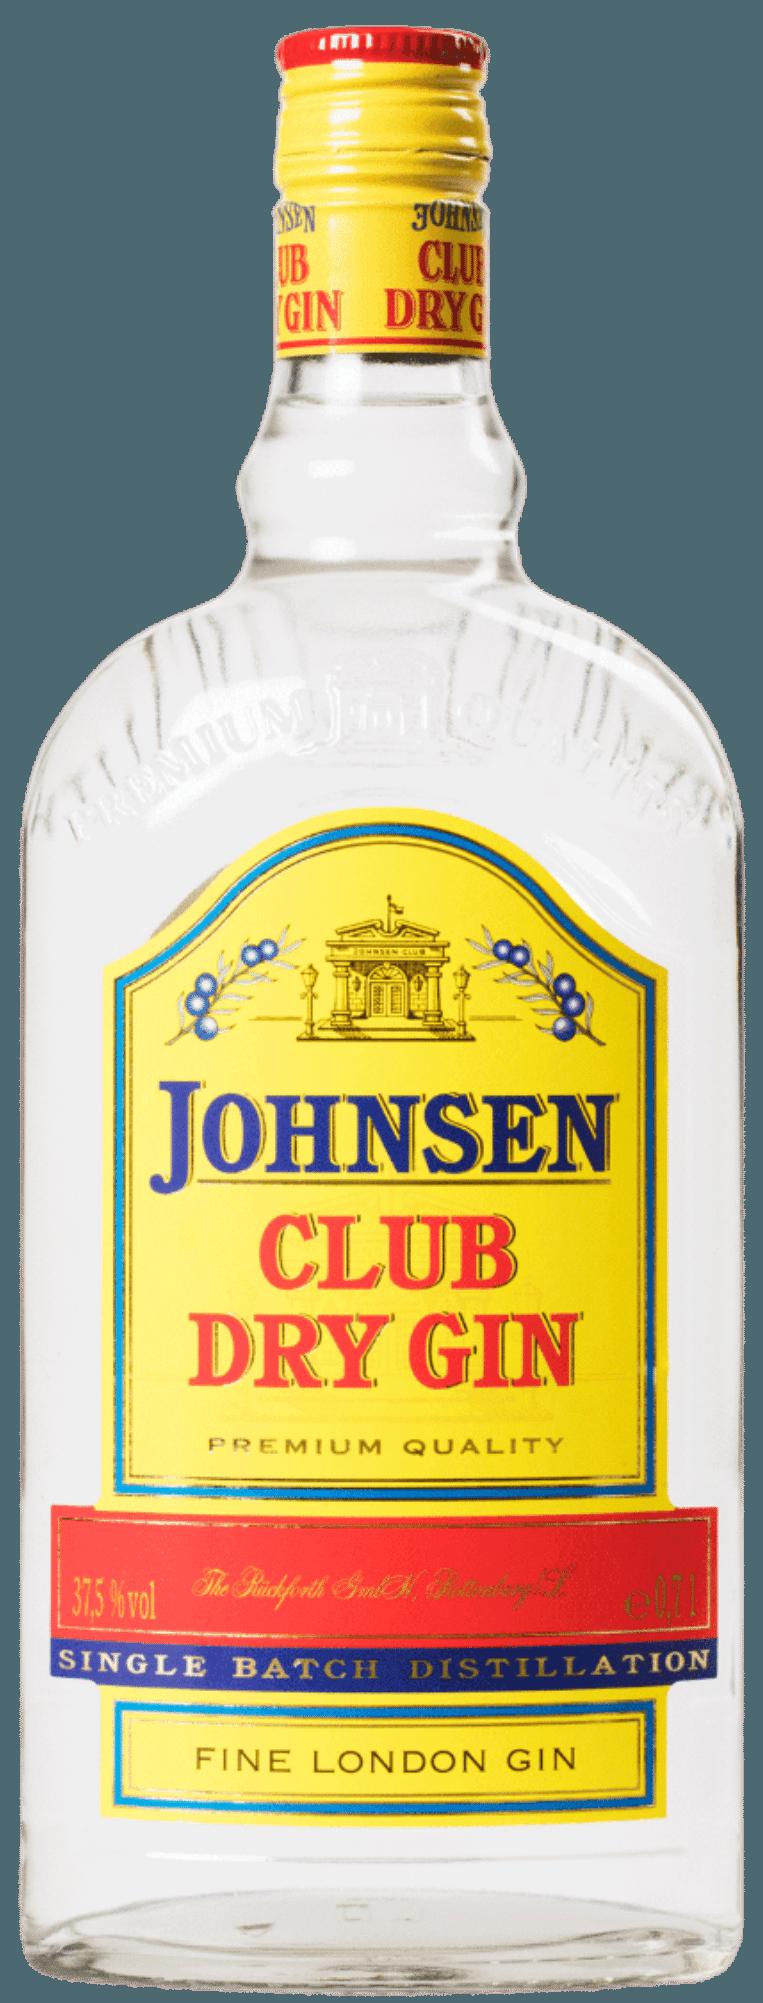 Johnsen Club Dry Gin-Aldi